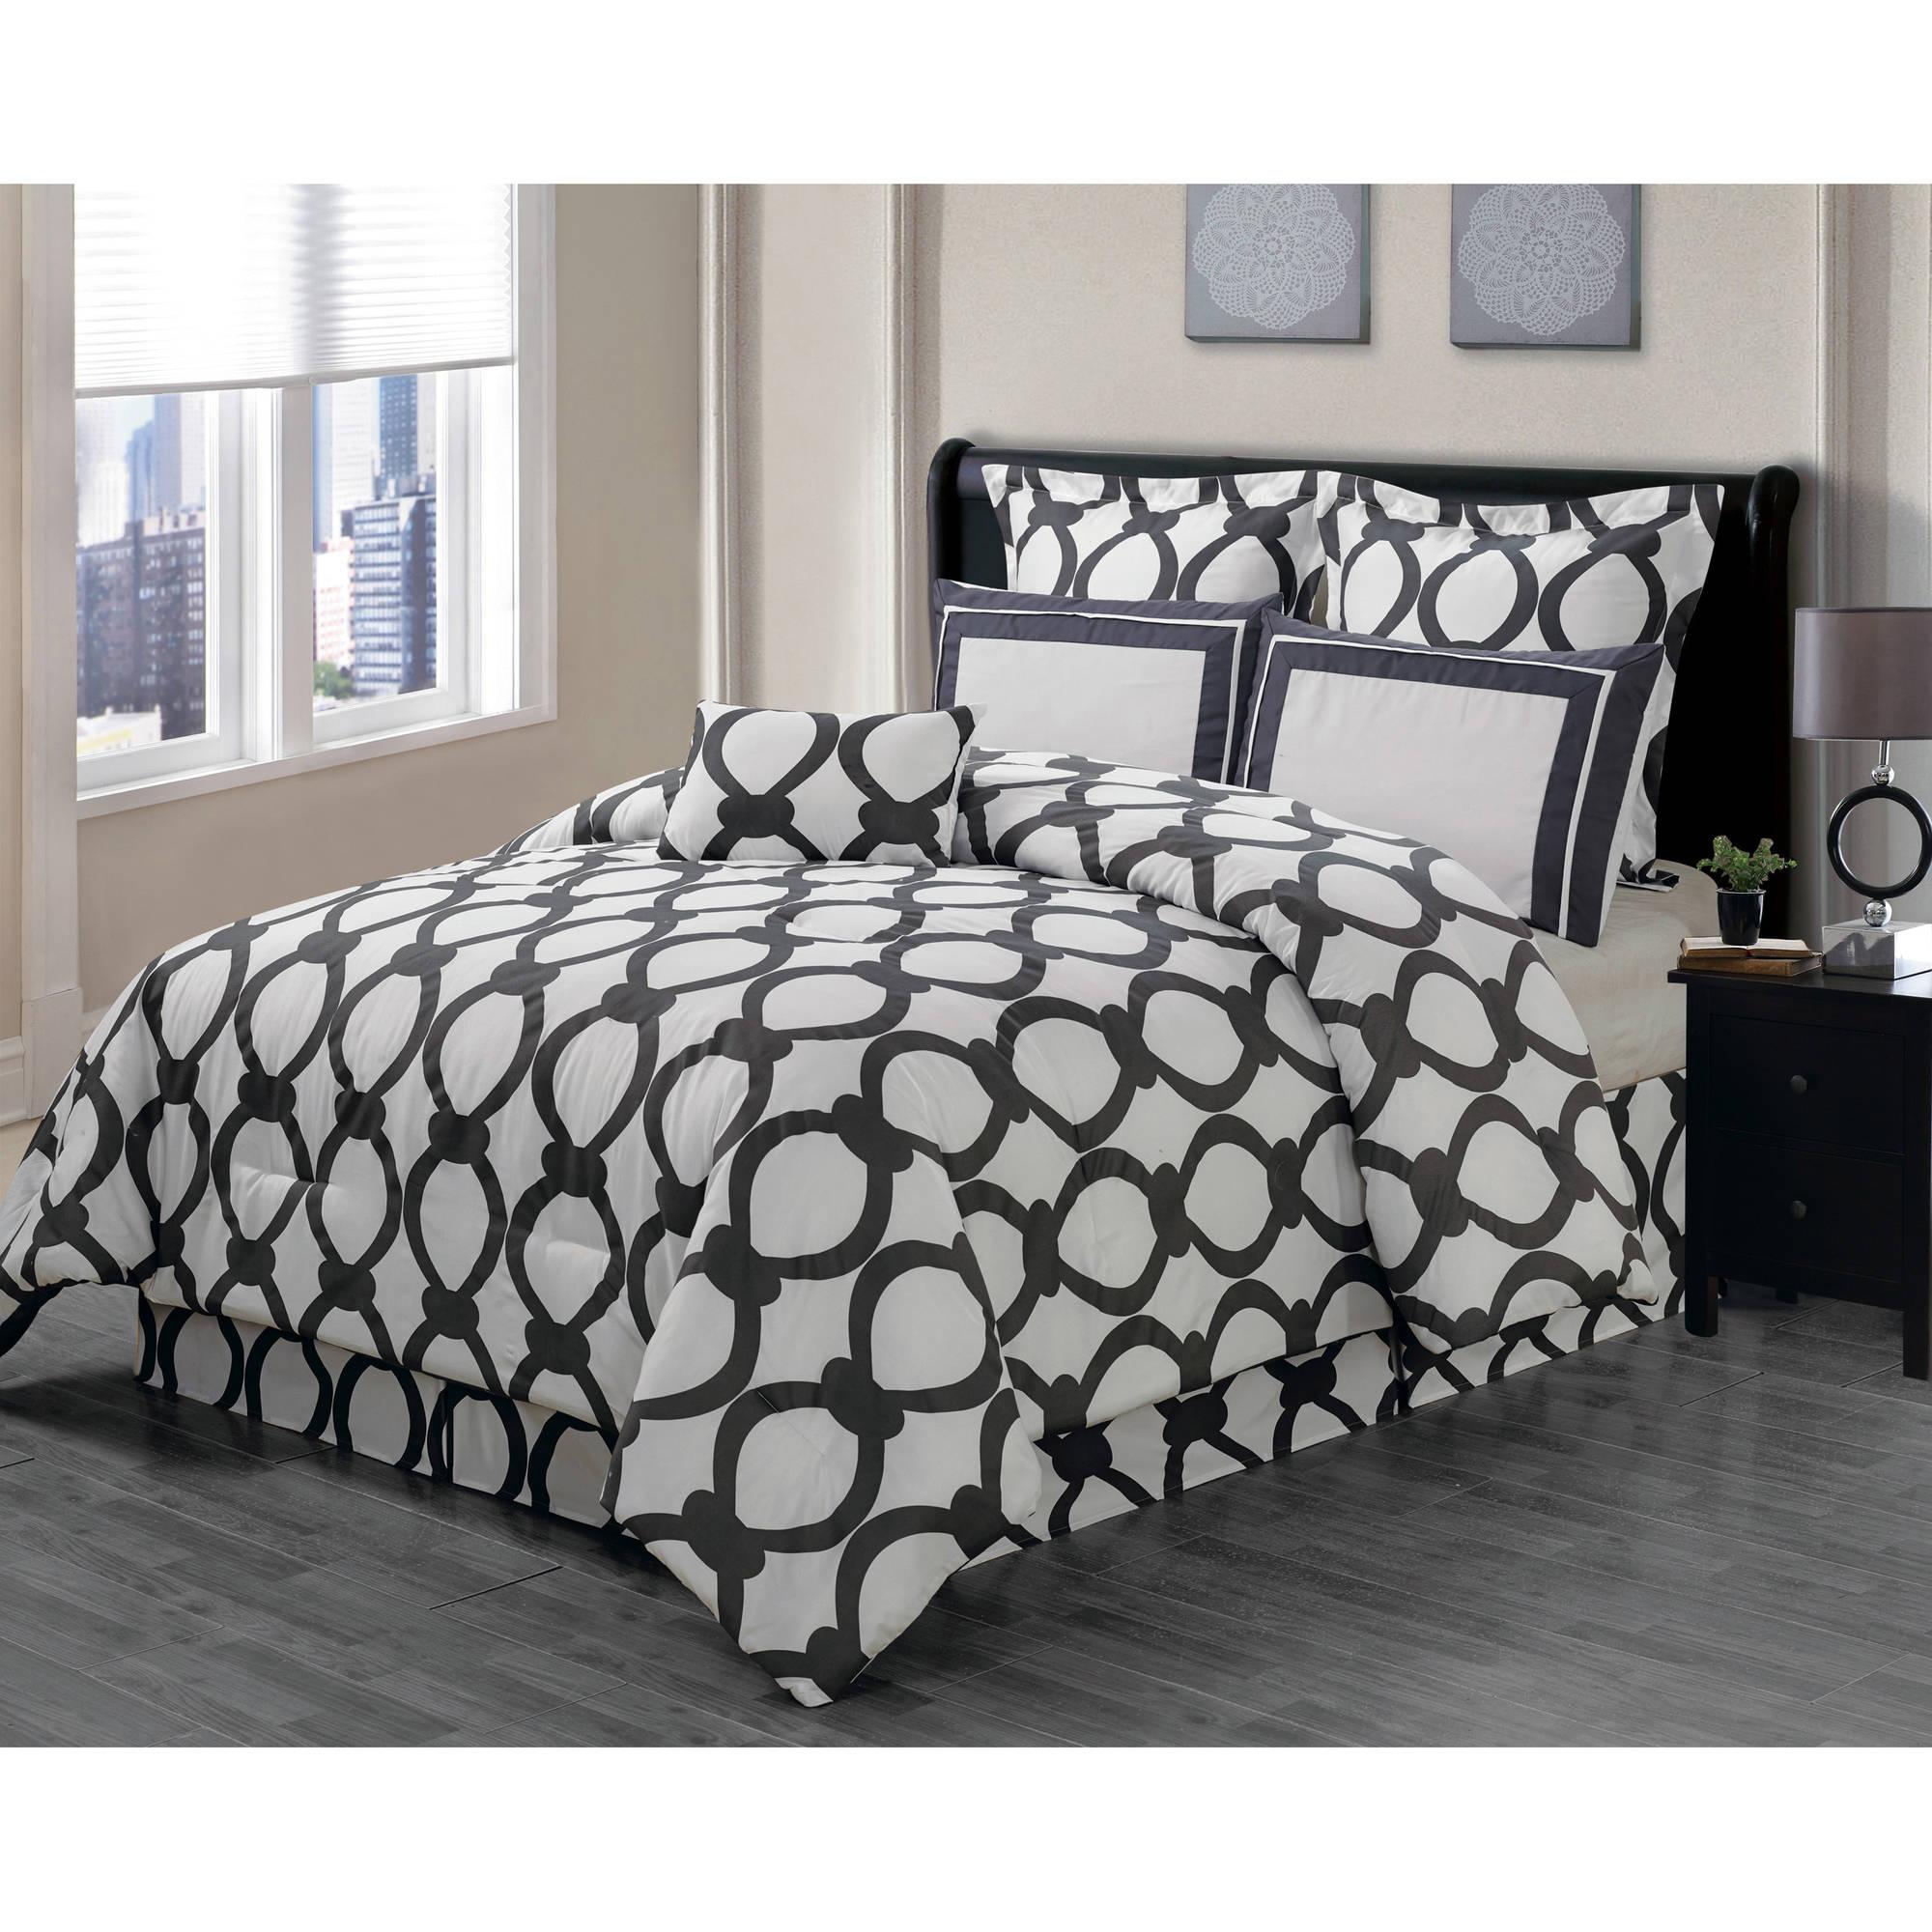 April Orchidea Flower Online 6 Piece Reversible Oversize & Overfilled Queen Comforter Set in Slate Grey